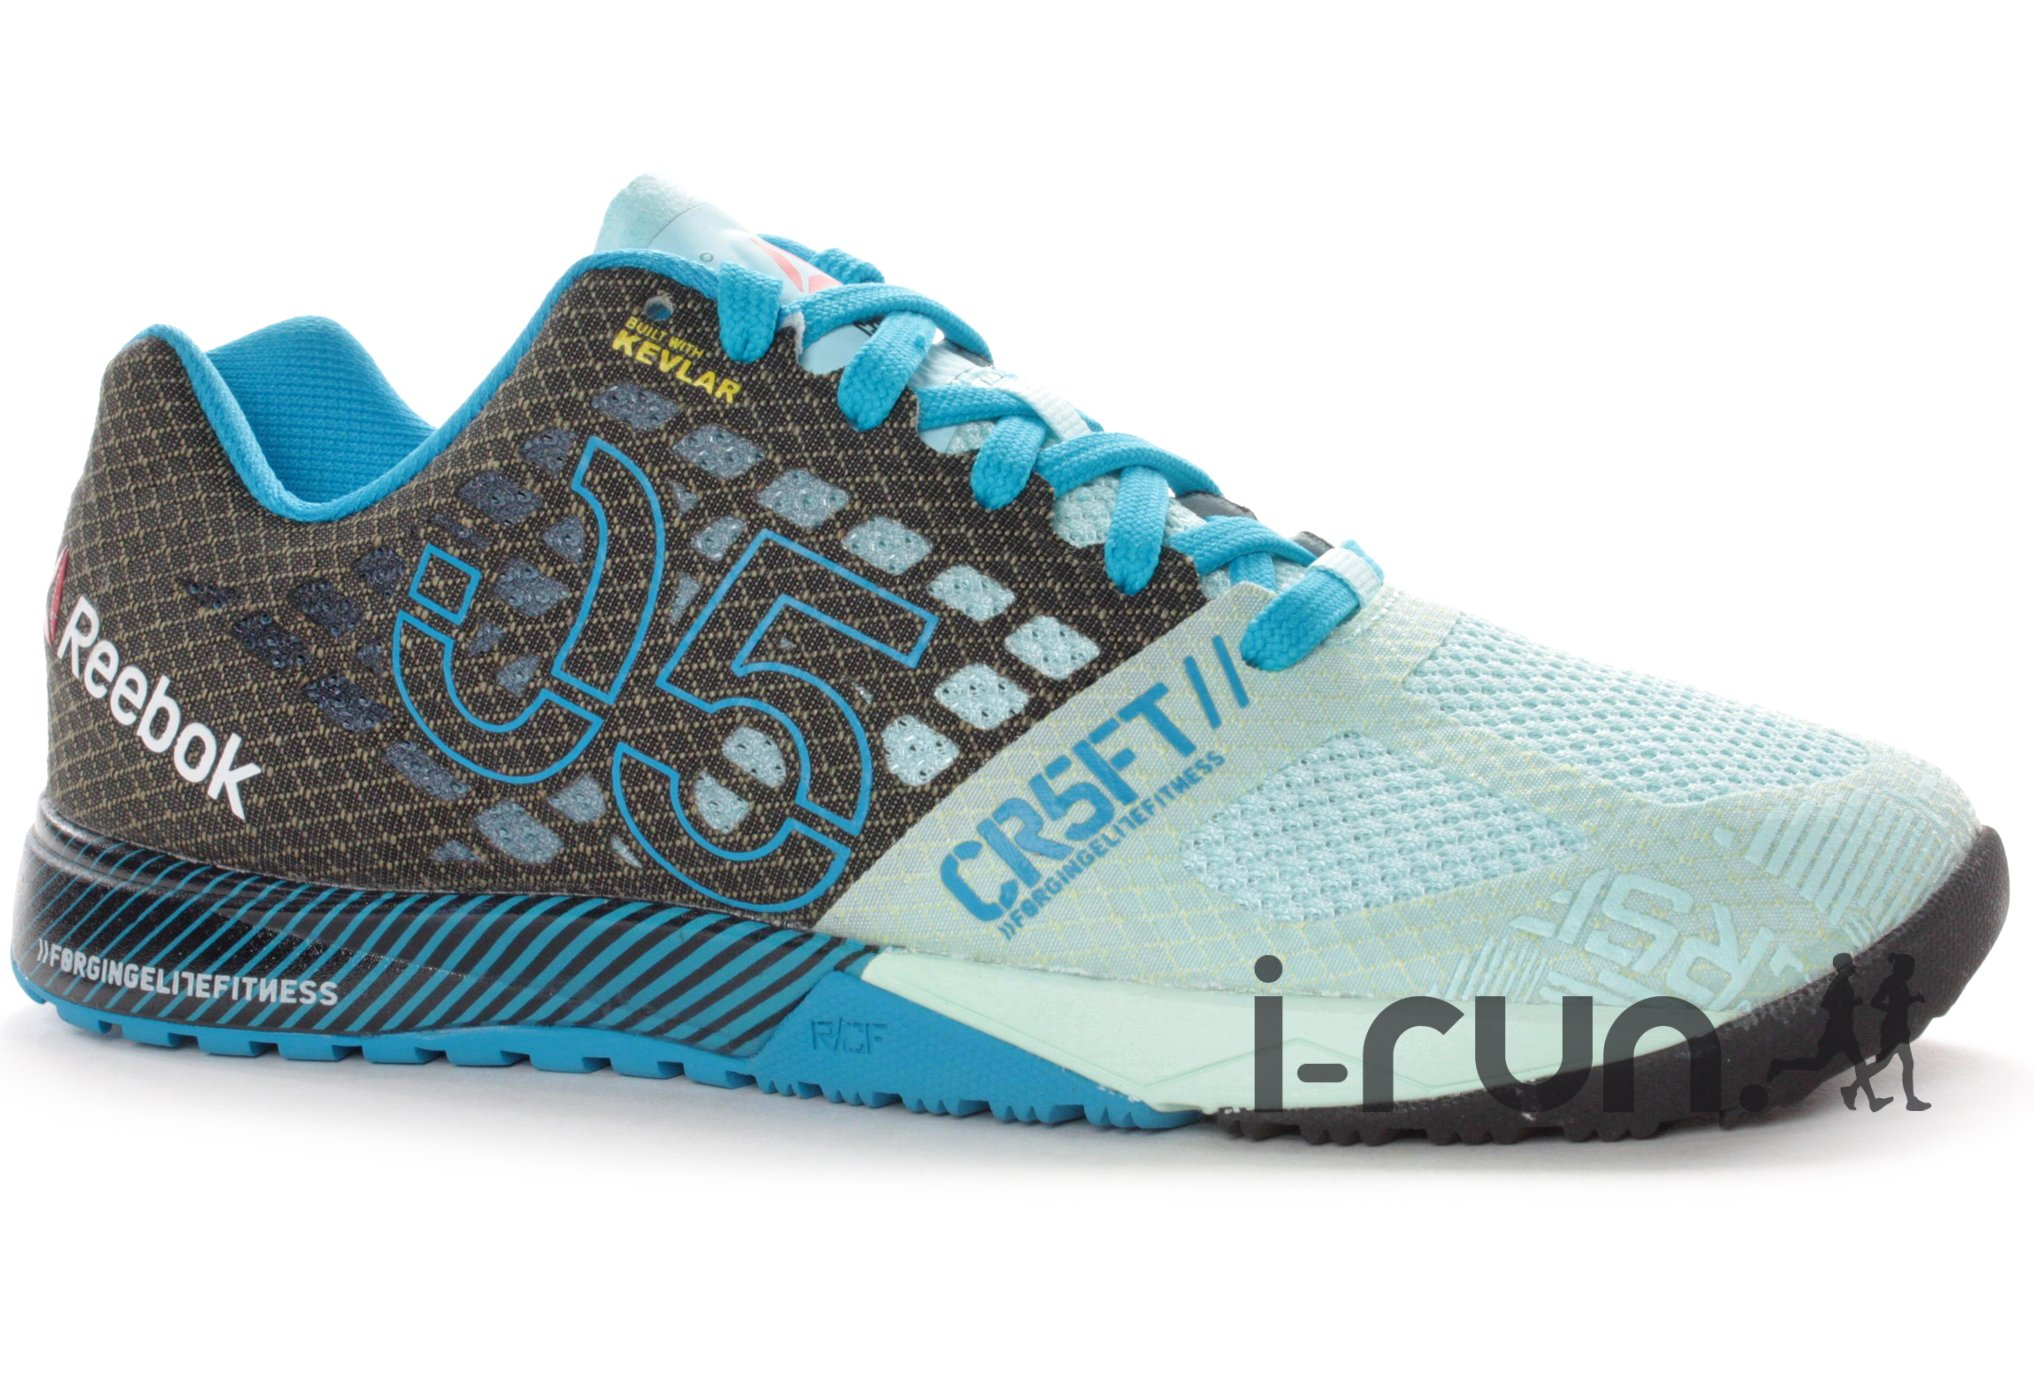 chaussure crossfit nano 5.0,reebok crossfit nano 5 0 m